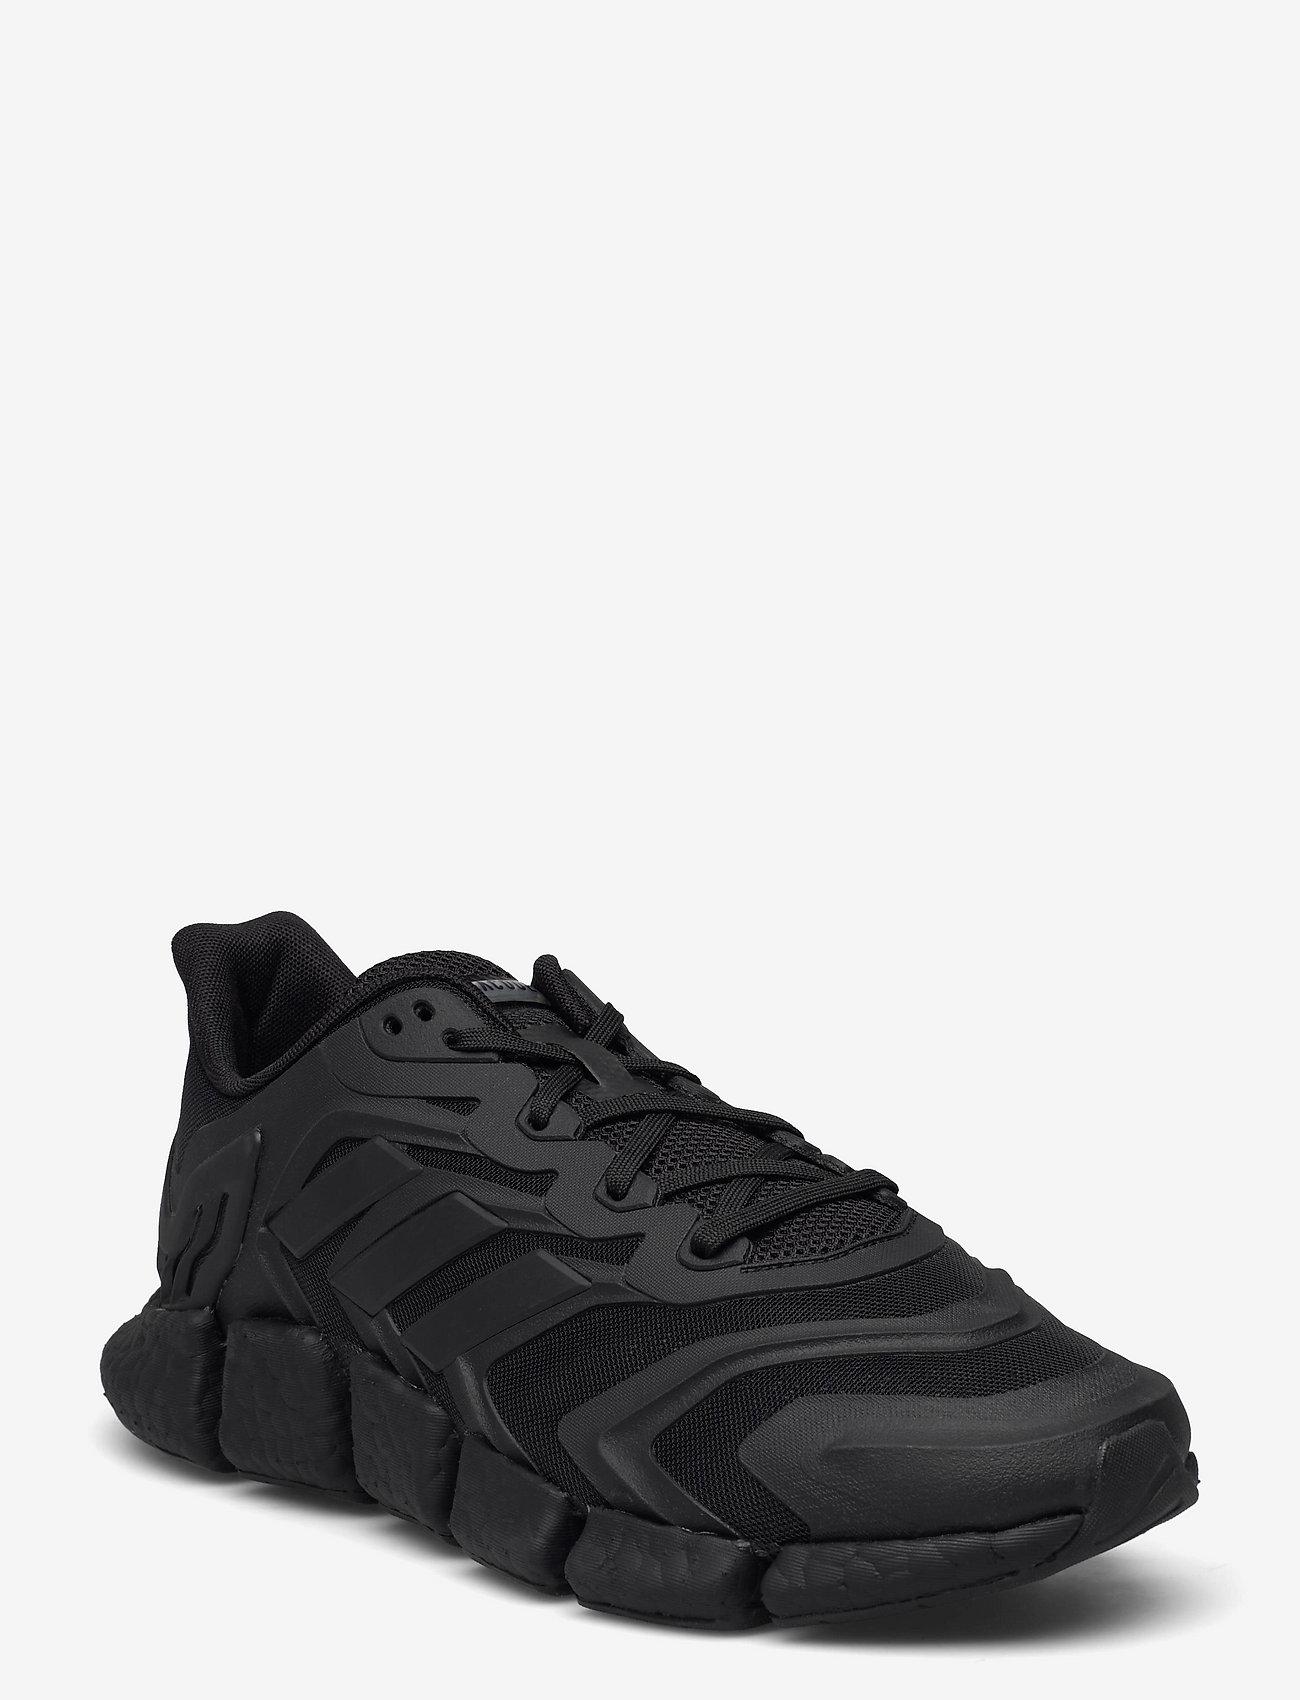 adidas Performance - Climacool Vento - running shoes - cblack/cblack/cblack - 0